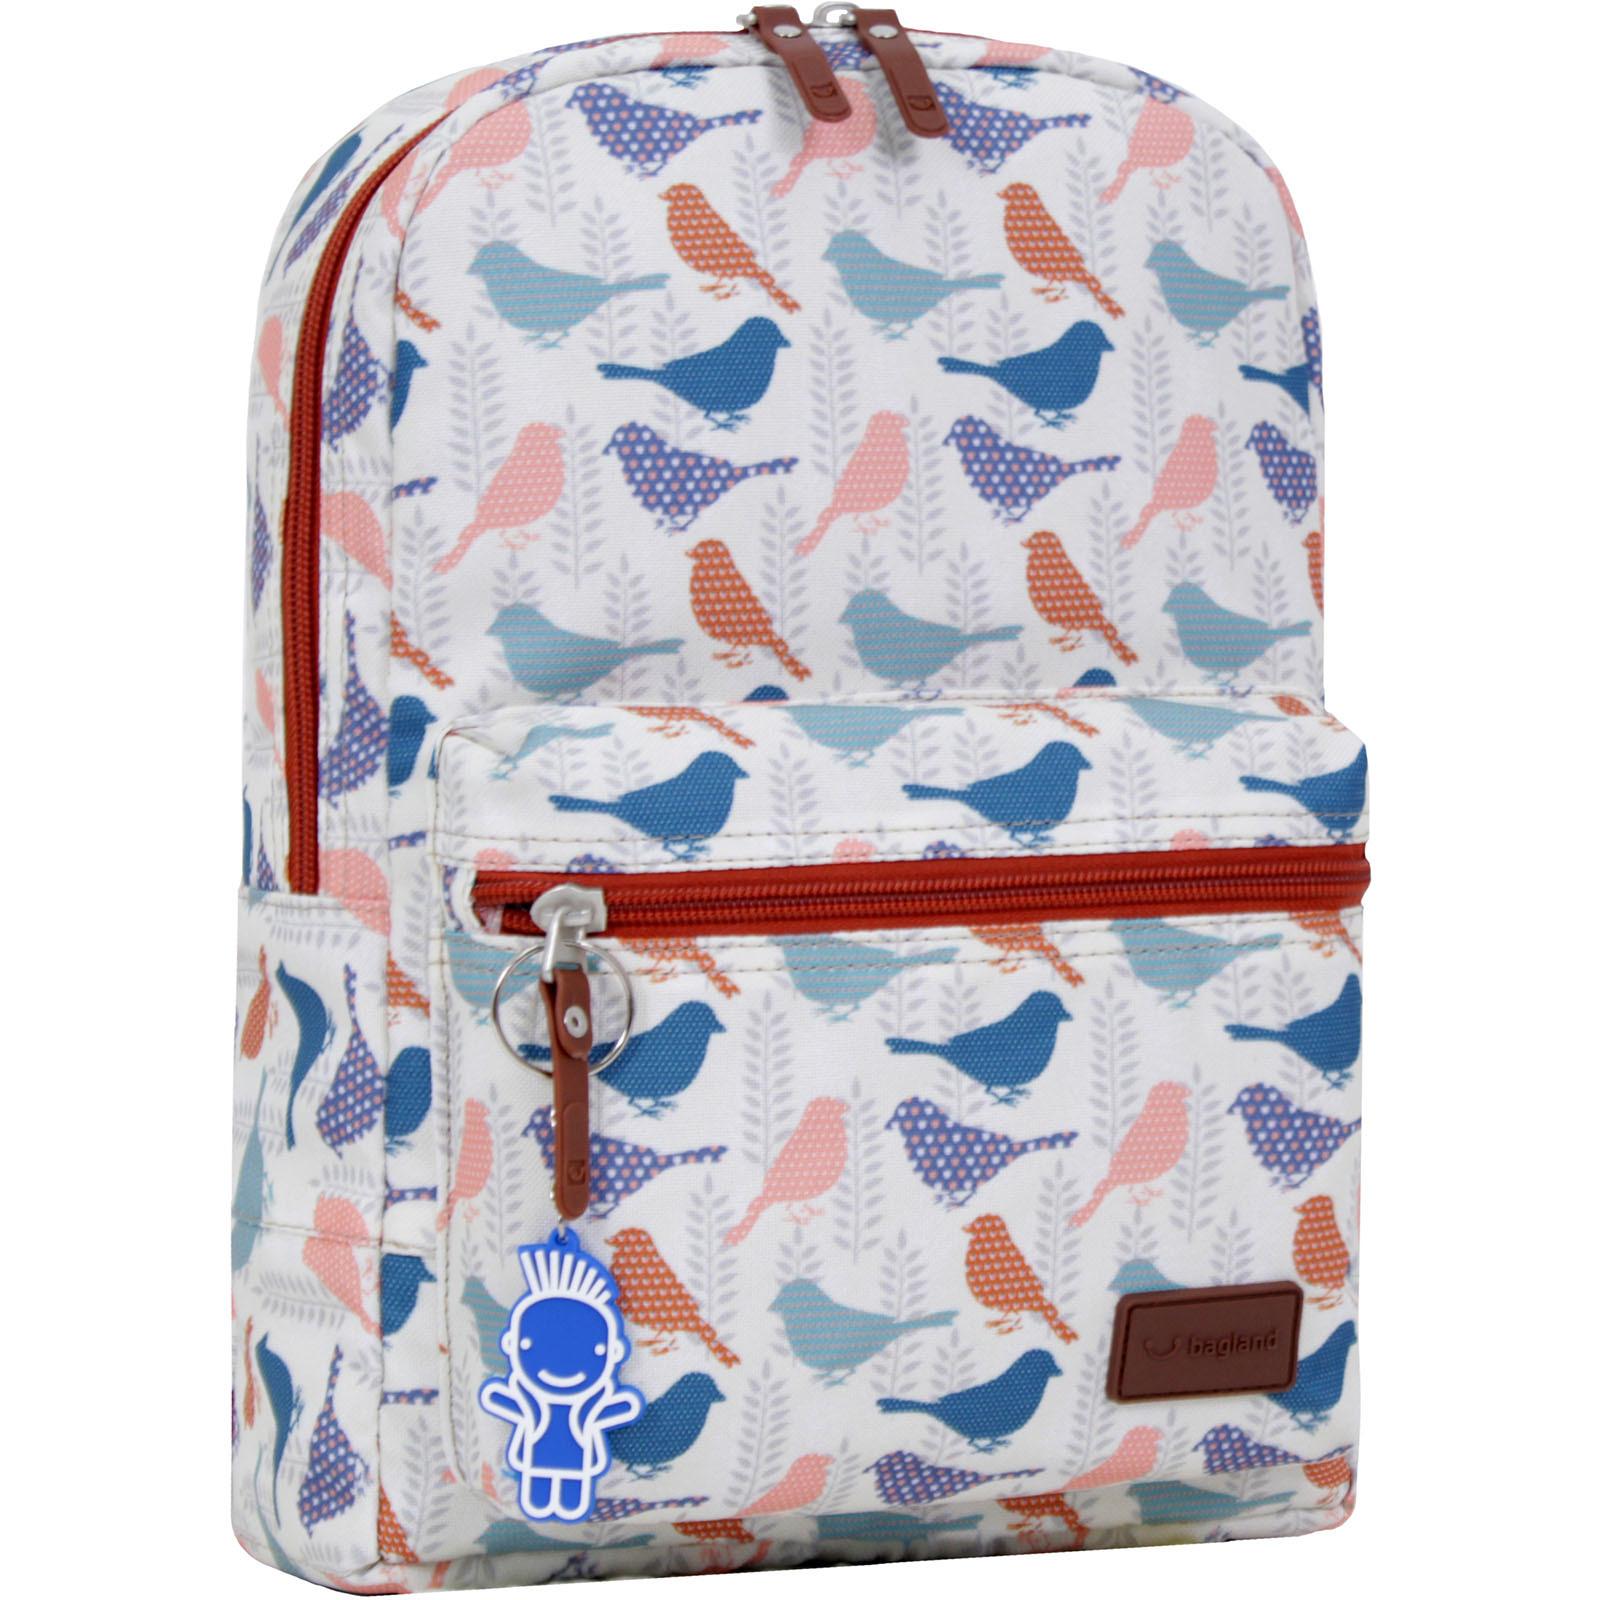 Детские рюкзаки Рюкзак Bagland Молодежный mini 8 л. сублімація 226 (00508664) IMG_0311_арт.226_.JPG